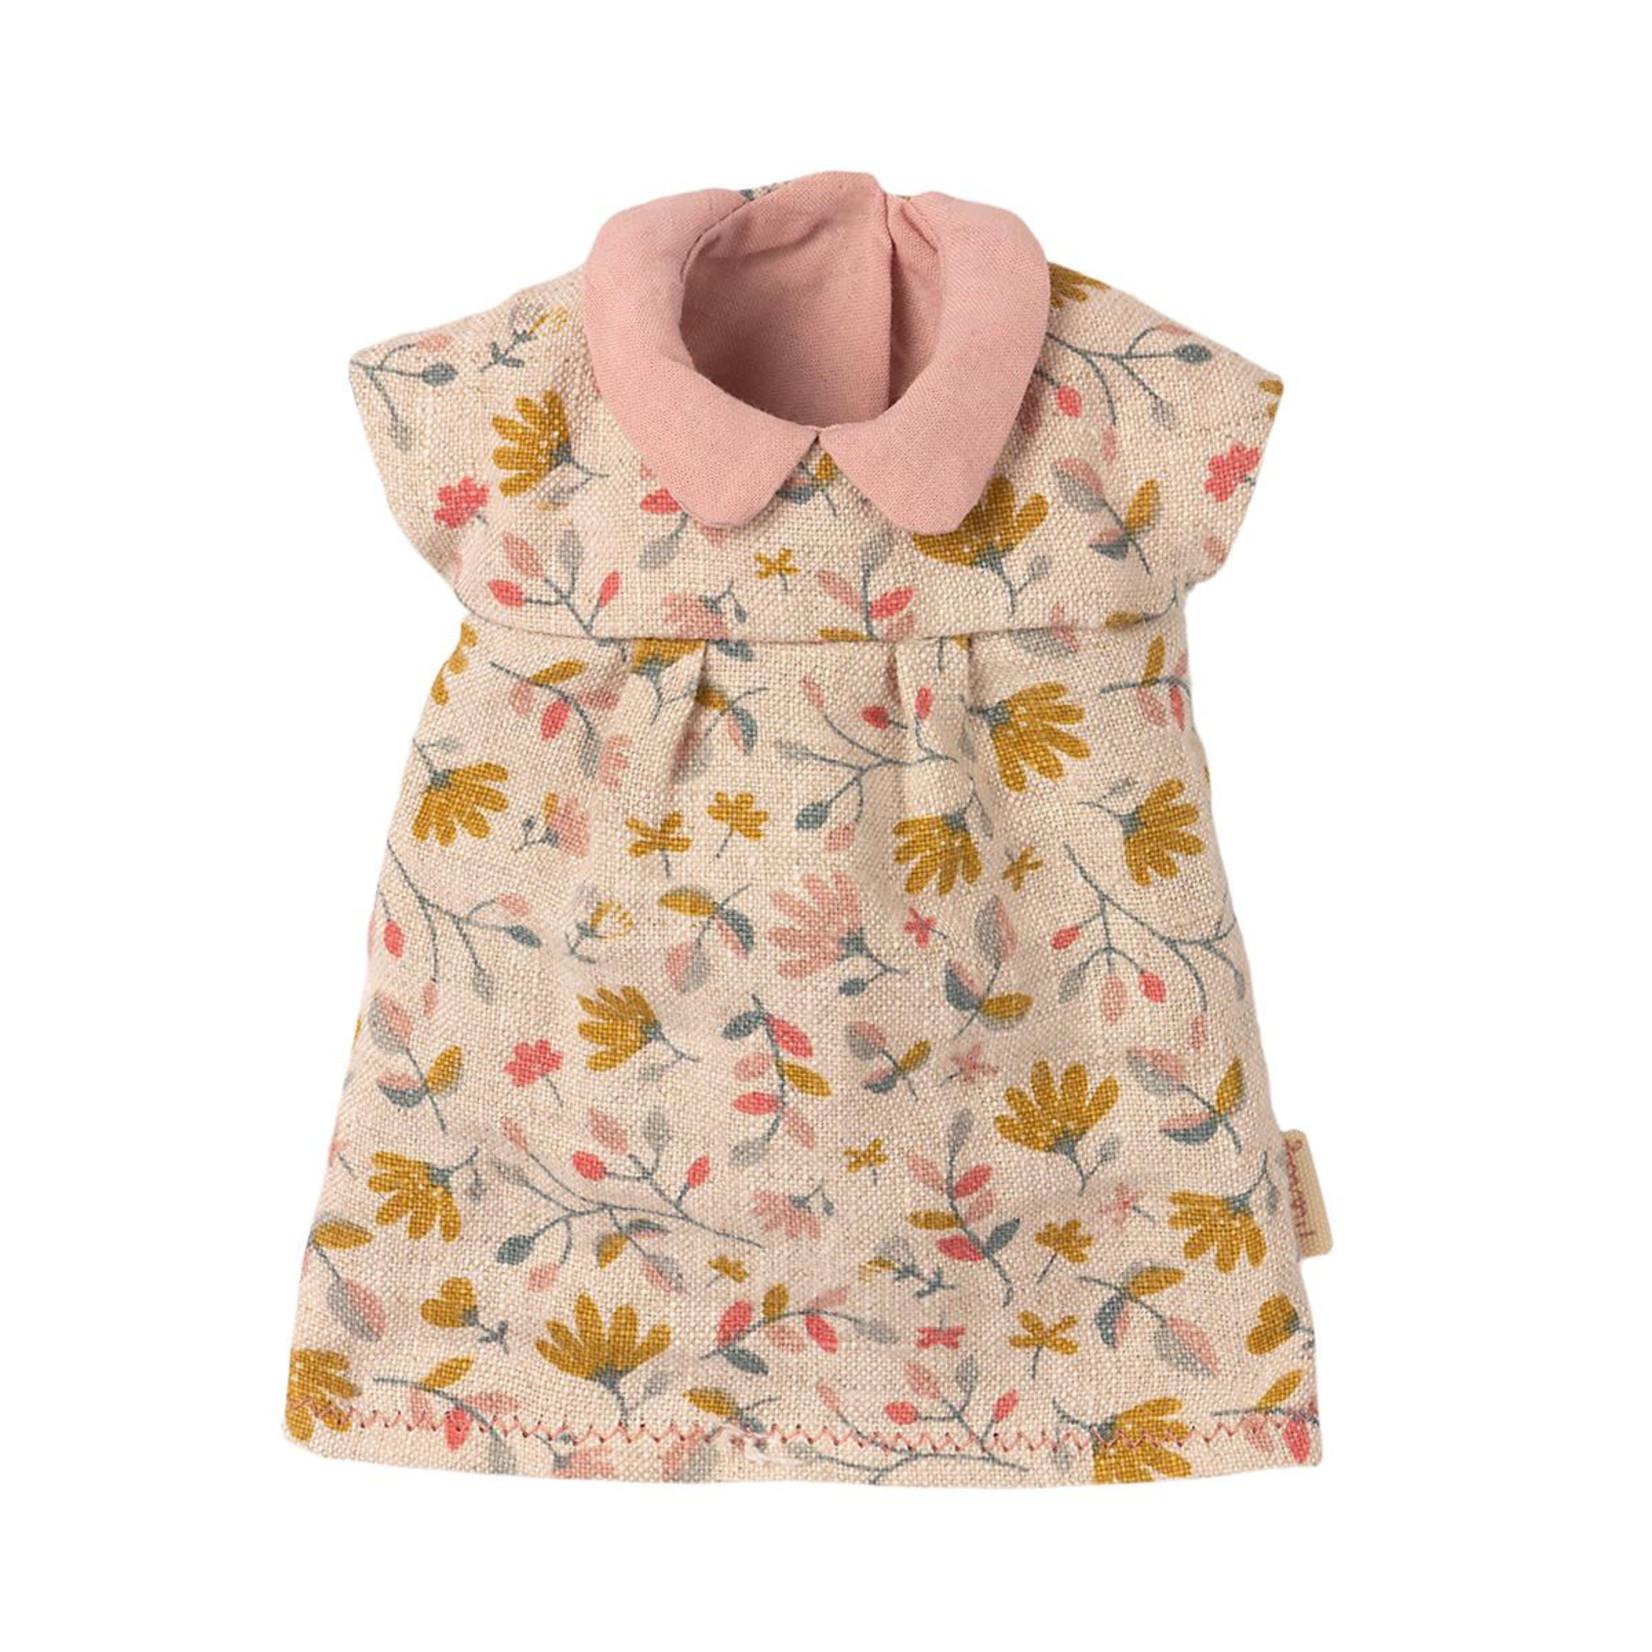 Maileg Maileg Dress for Teddy mum